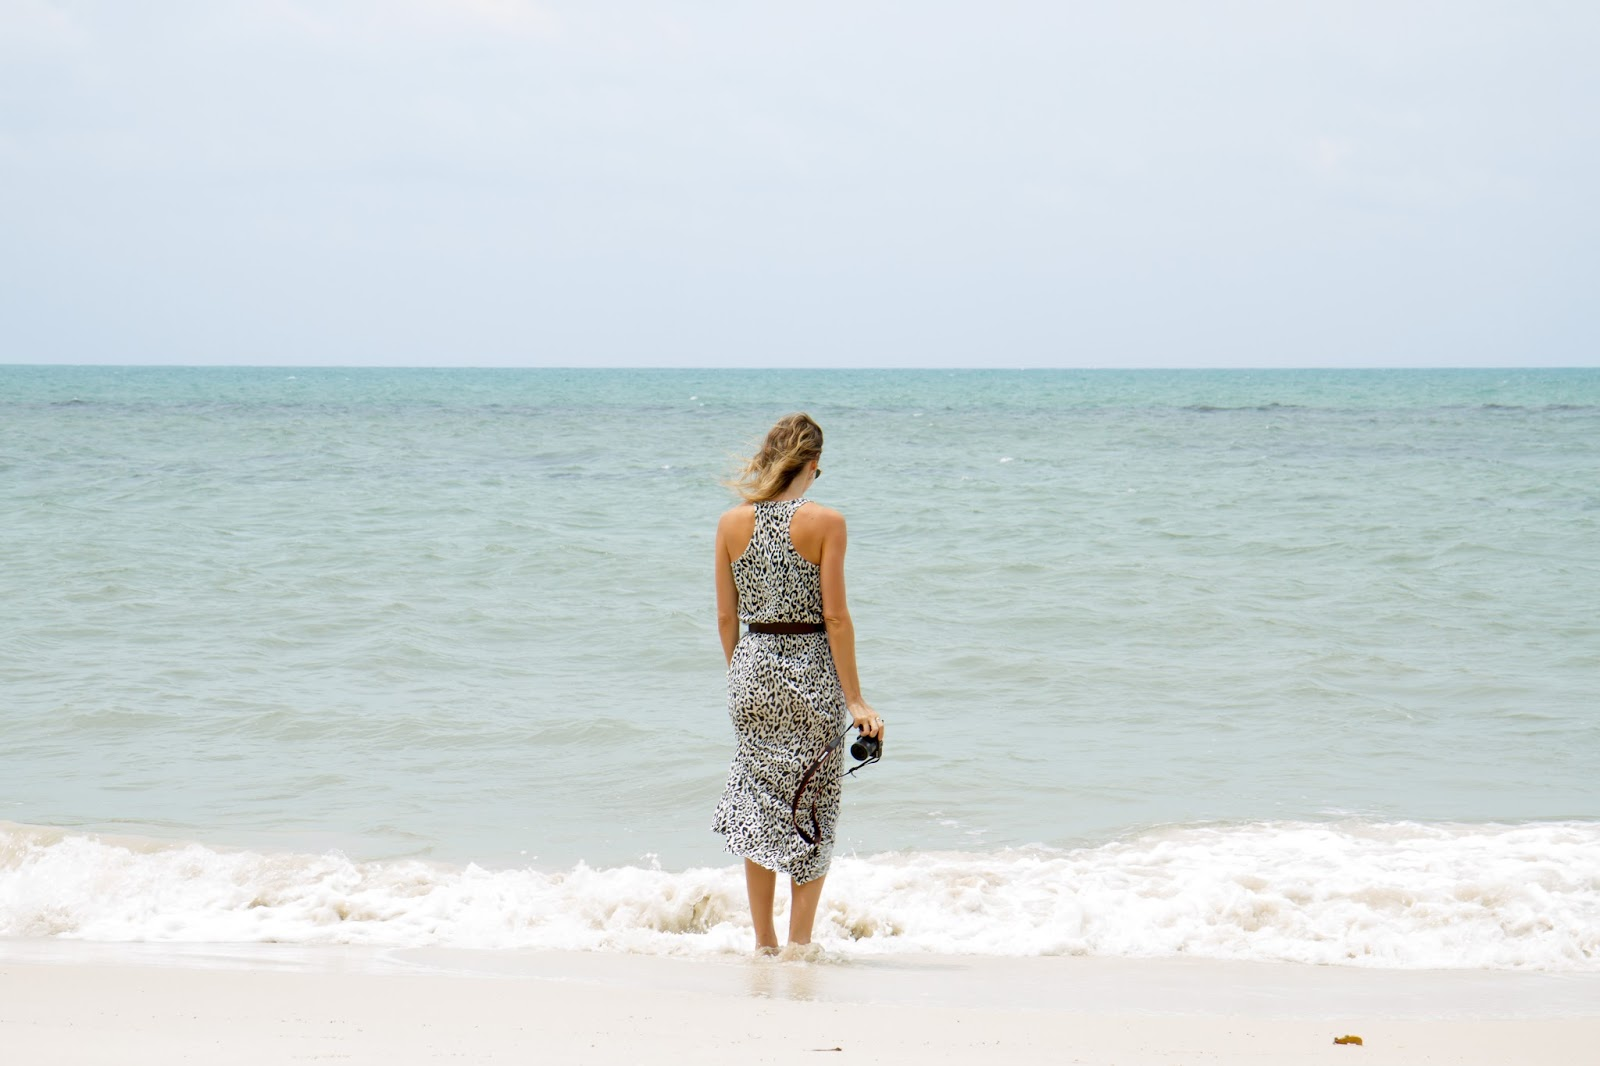 travel blogger, Alison Hutchinson, on a white sandy beach in belitung